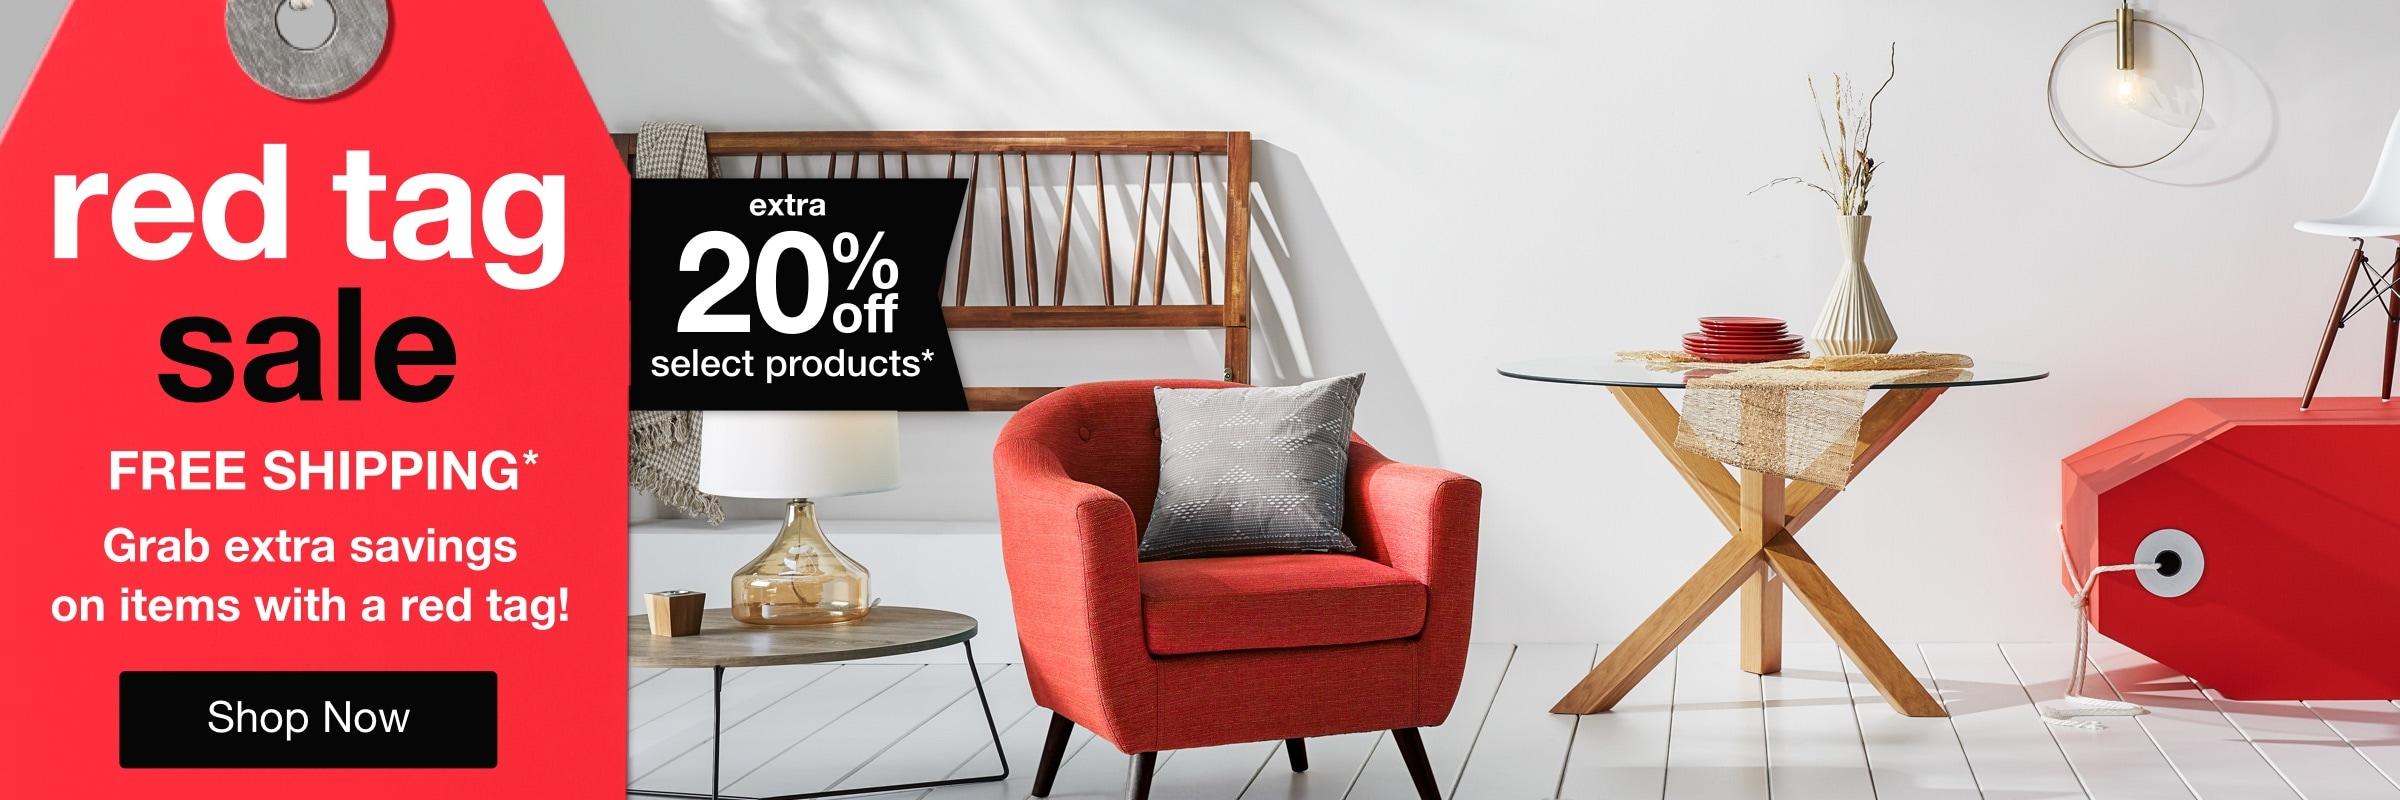 Terrific Overstock Com Sales Deals Shop The Best Discounts Online Home Interior And Landscaping Elinuenasavecom